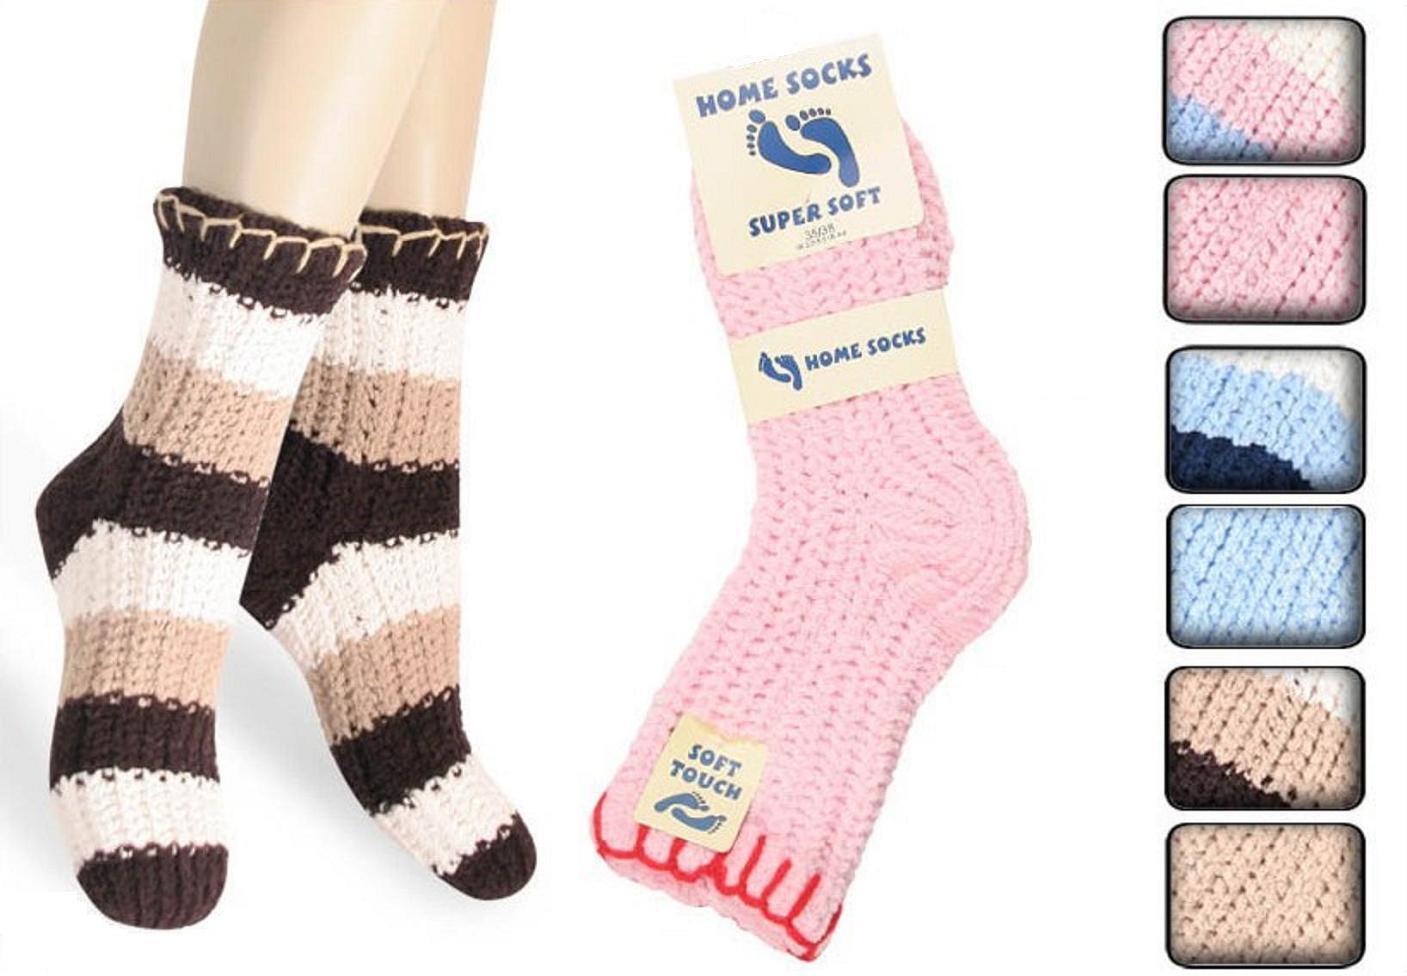 2 Paar Home Socks Bettsocken Super Soft 2D2